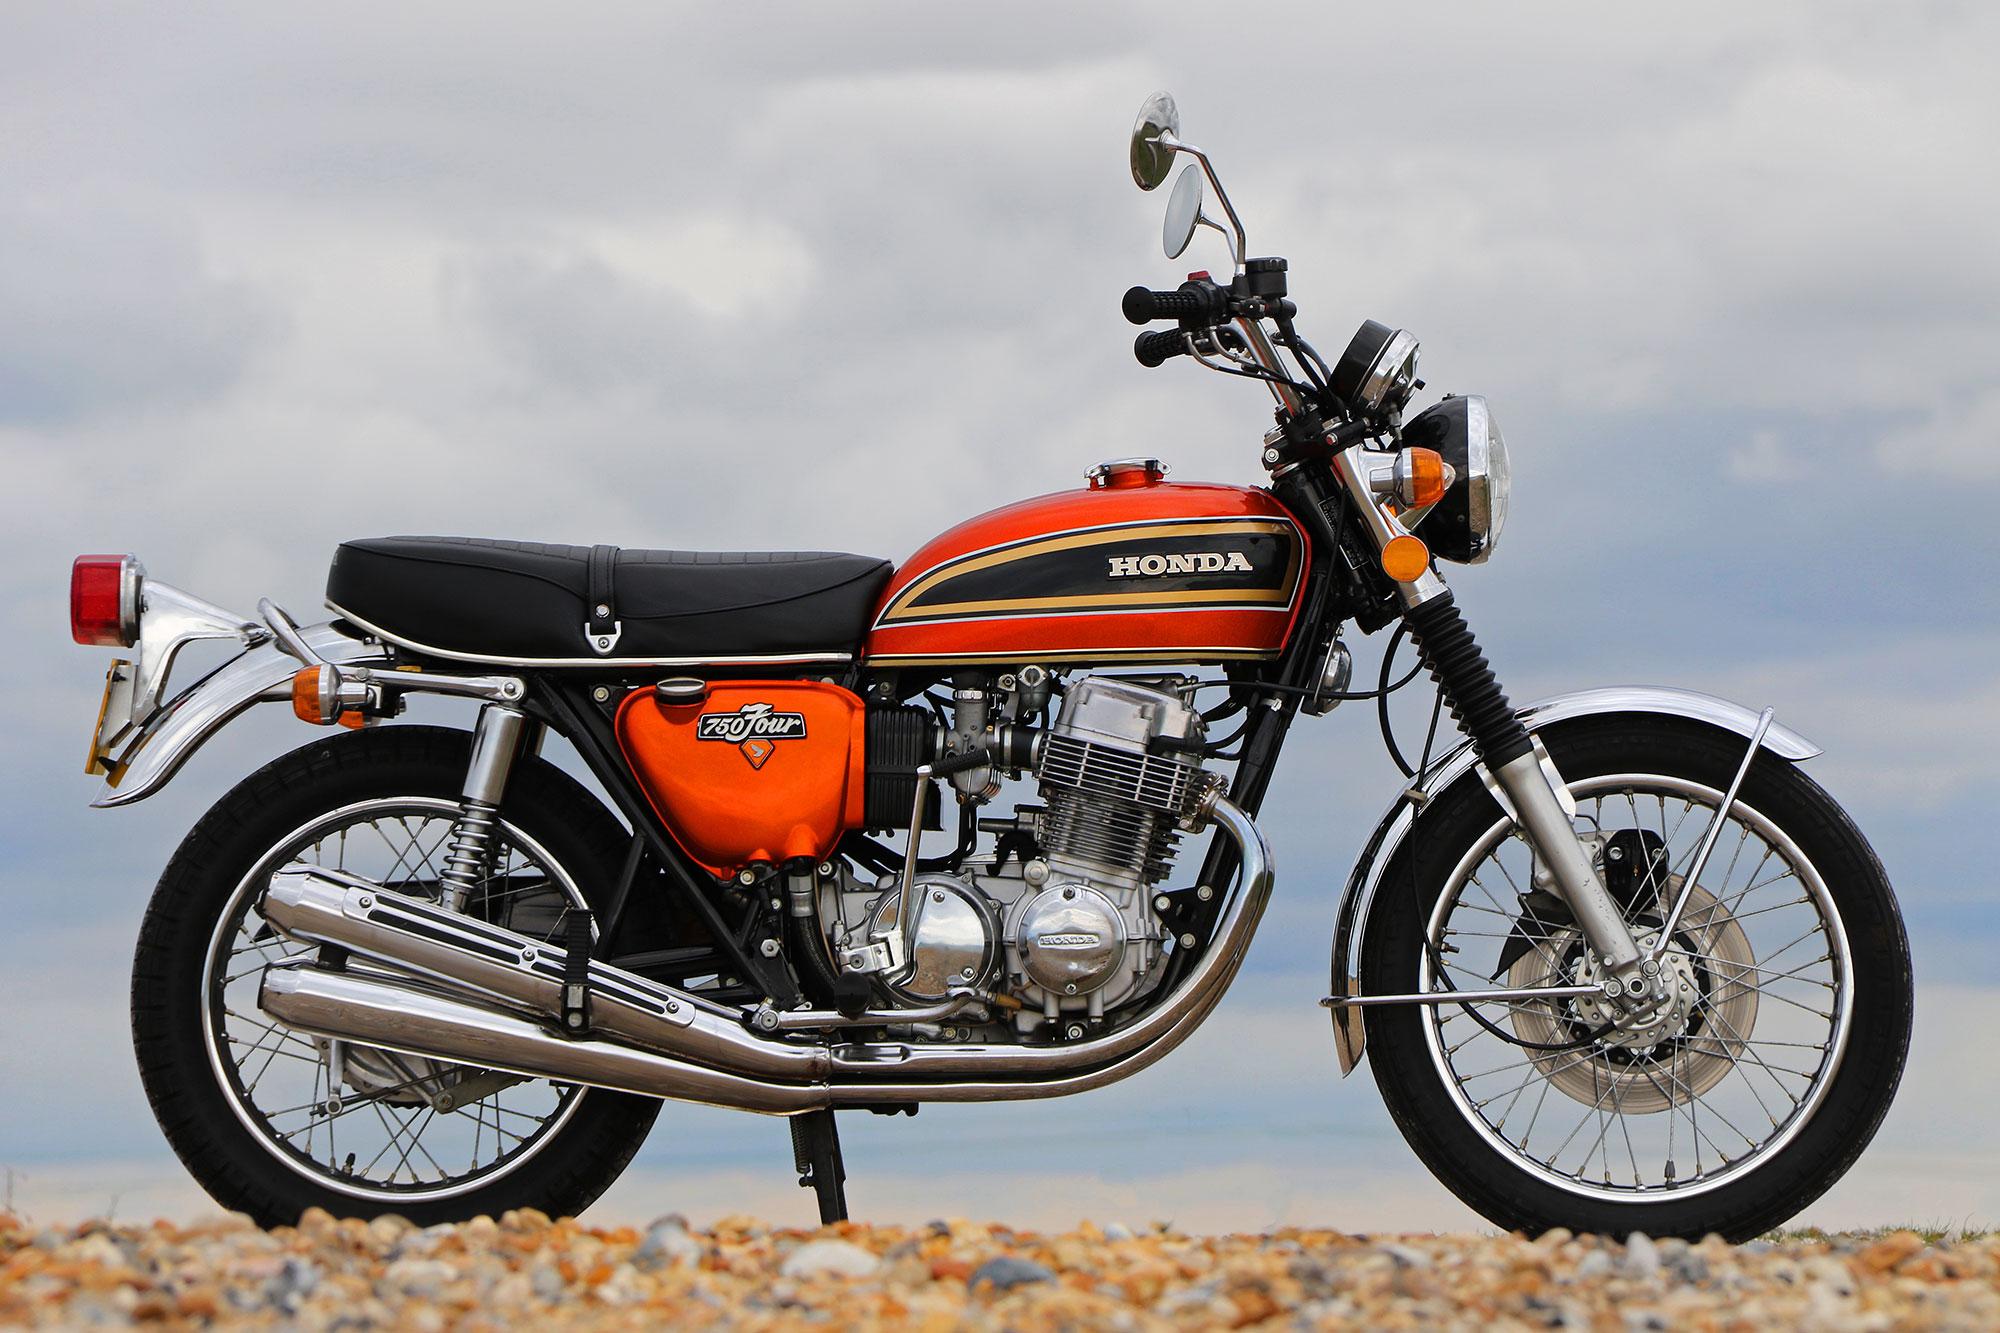 Honda Cb750 K3 1973 For Sale    Proper Bikes